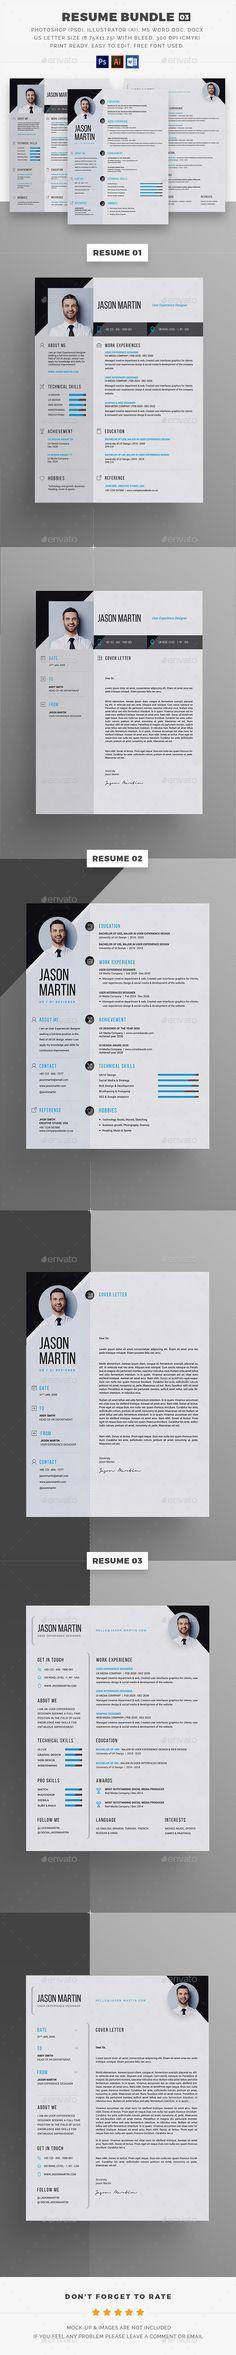 Modern-CV - Personal Resume Template Pinterest Resume cv, Psd